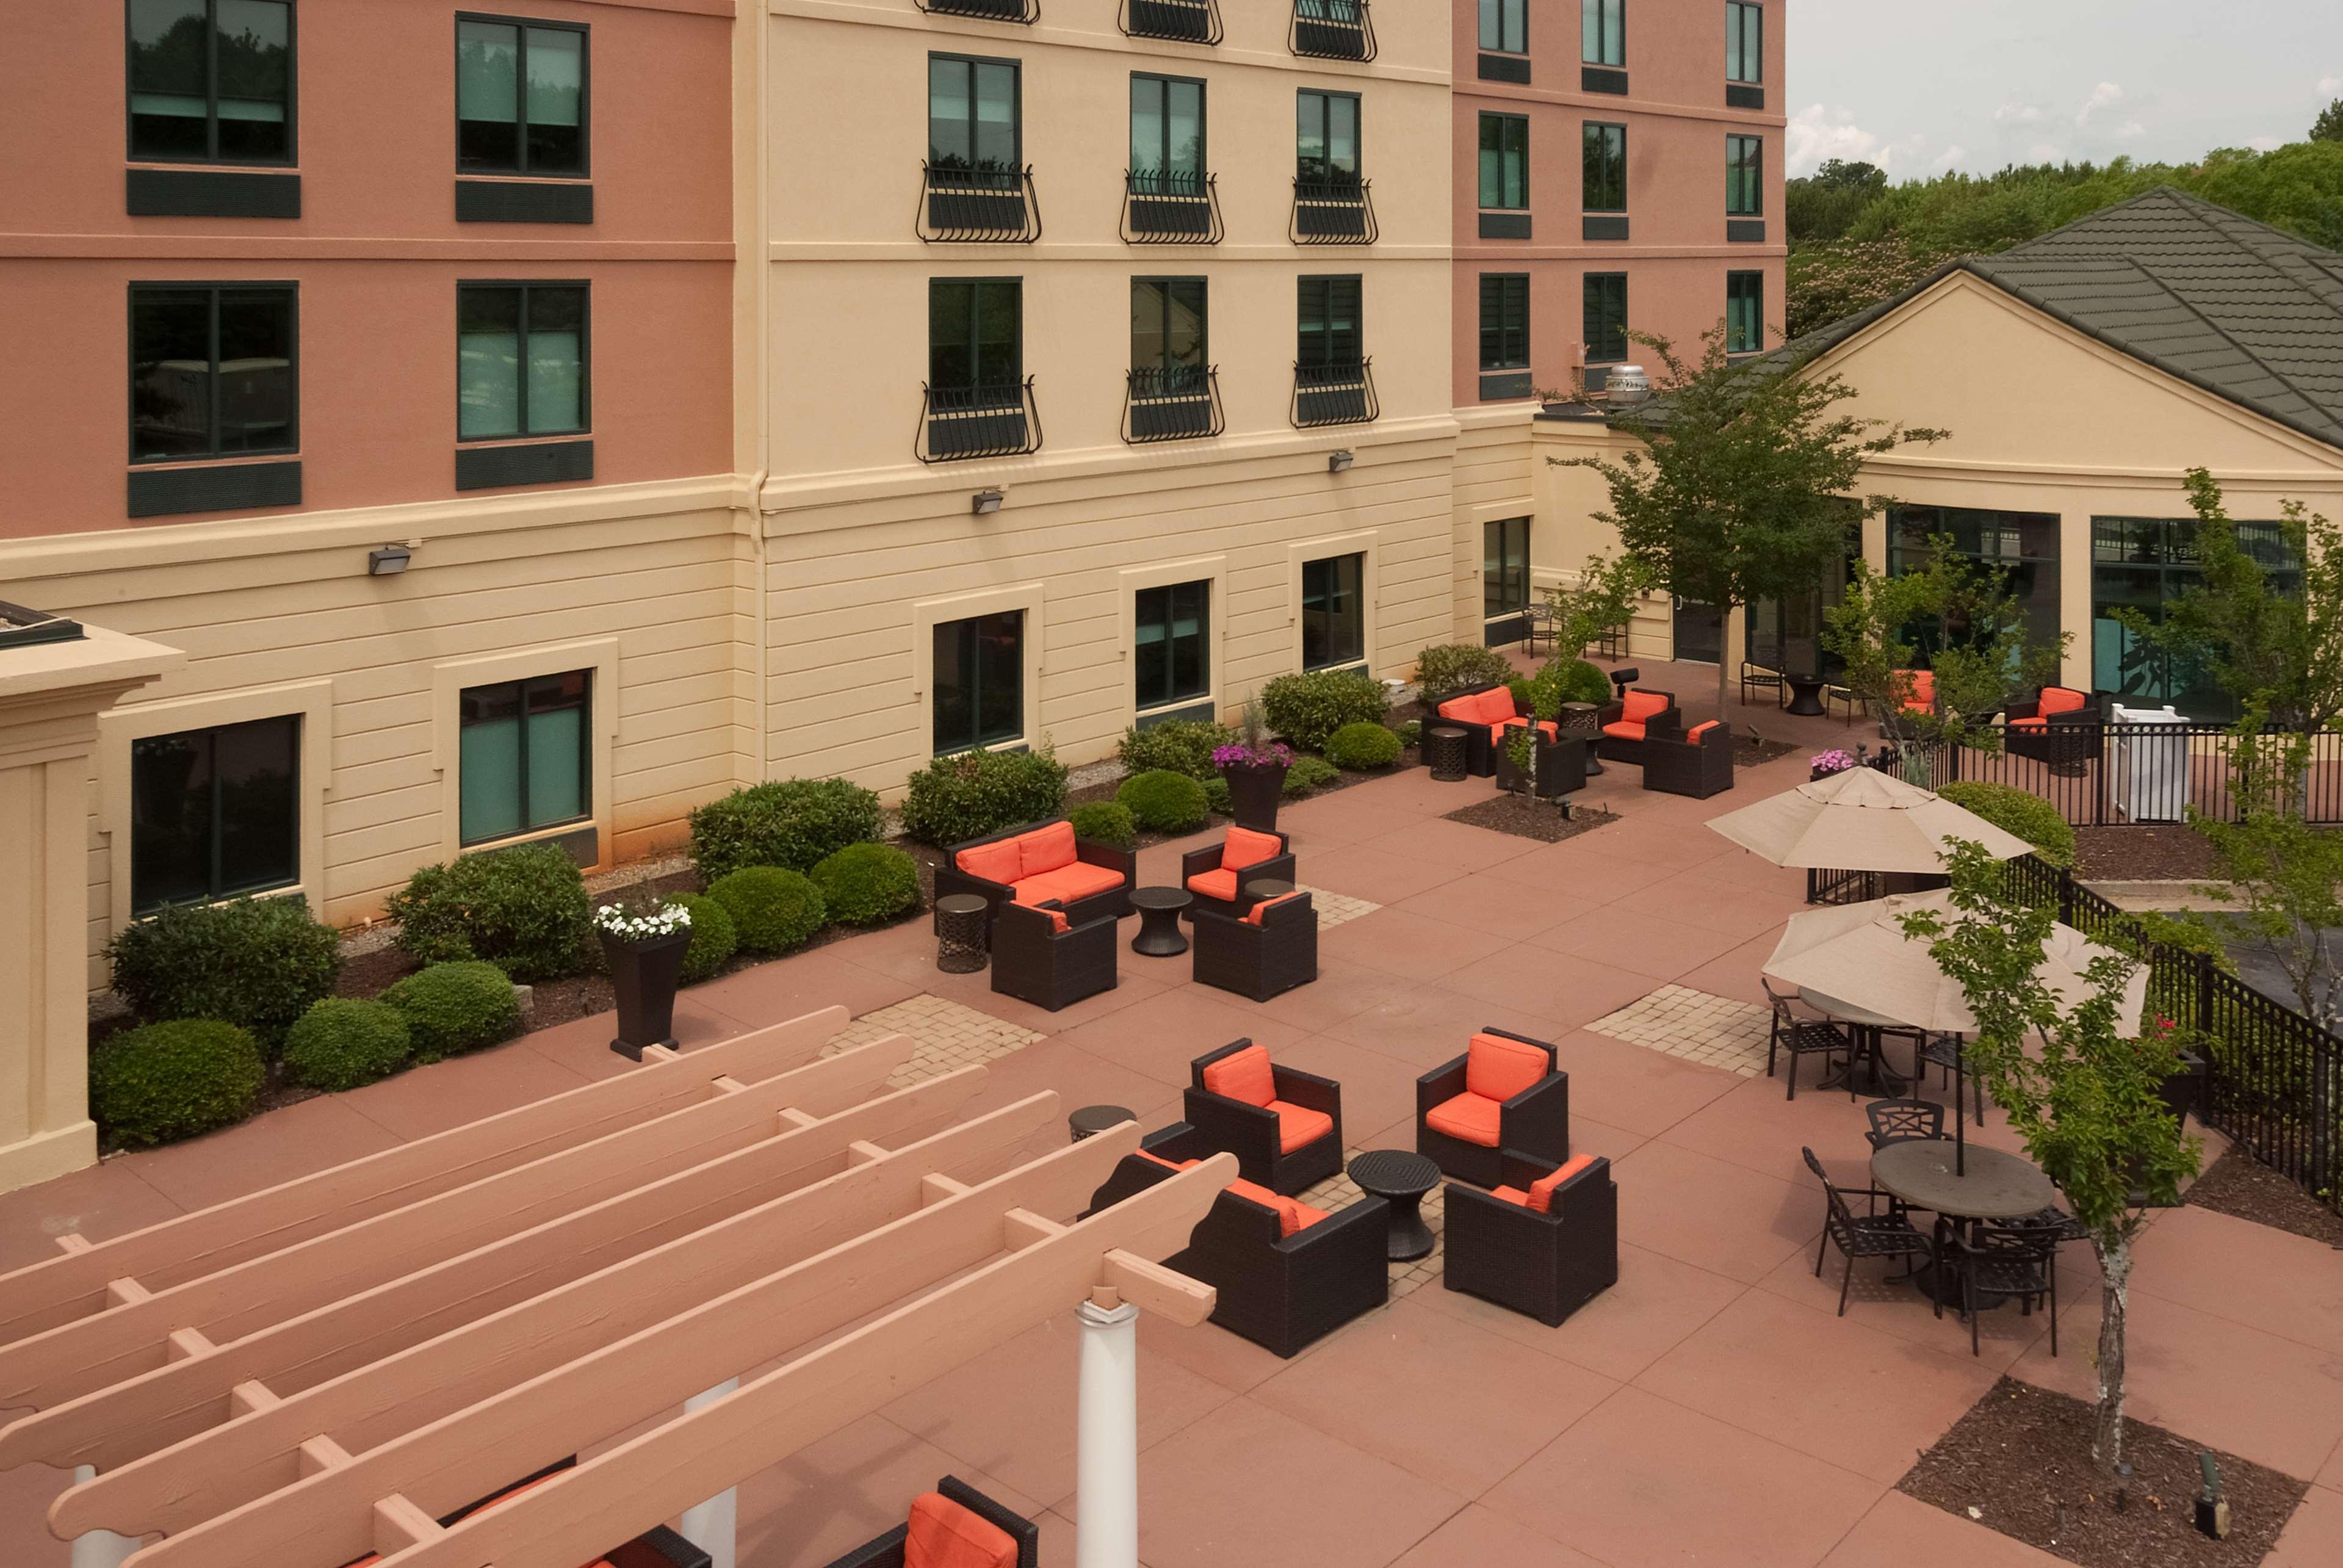 Hilton Garden Inn Atlanta Airport/Millenium Center image 0